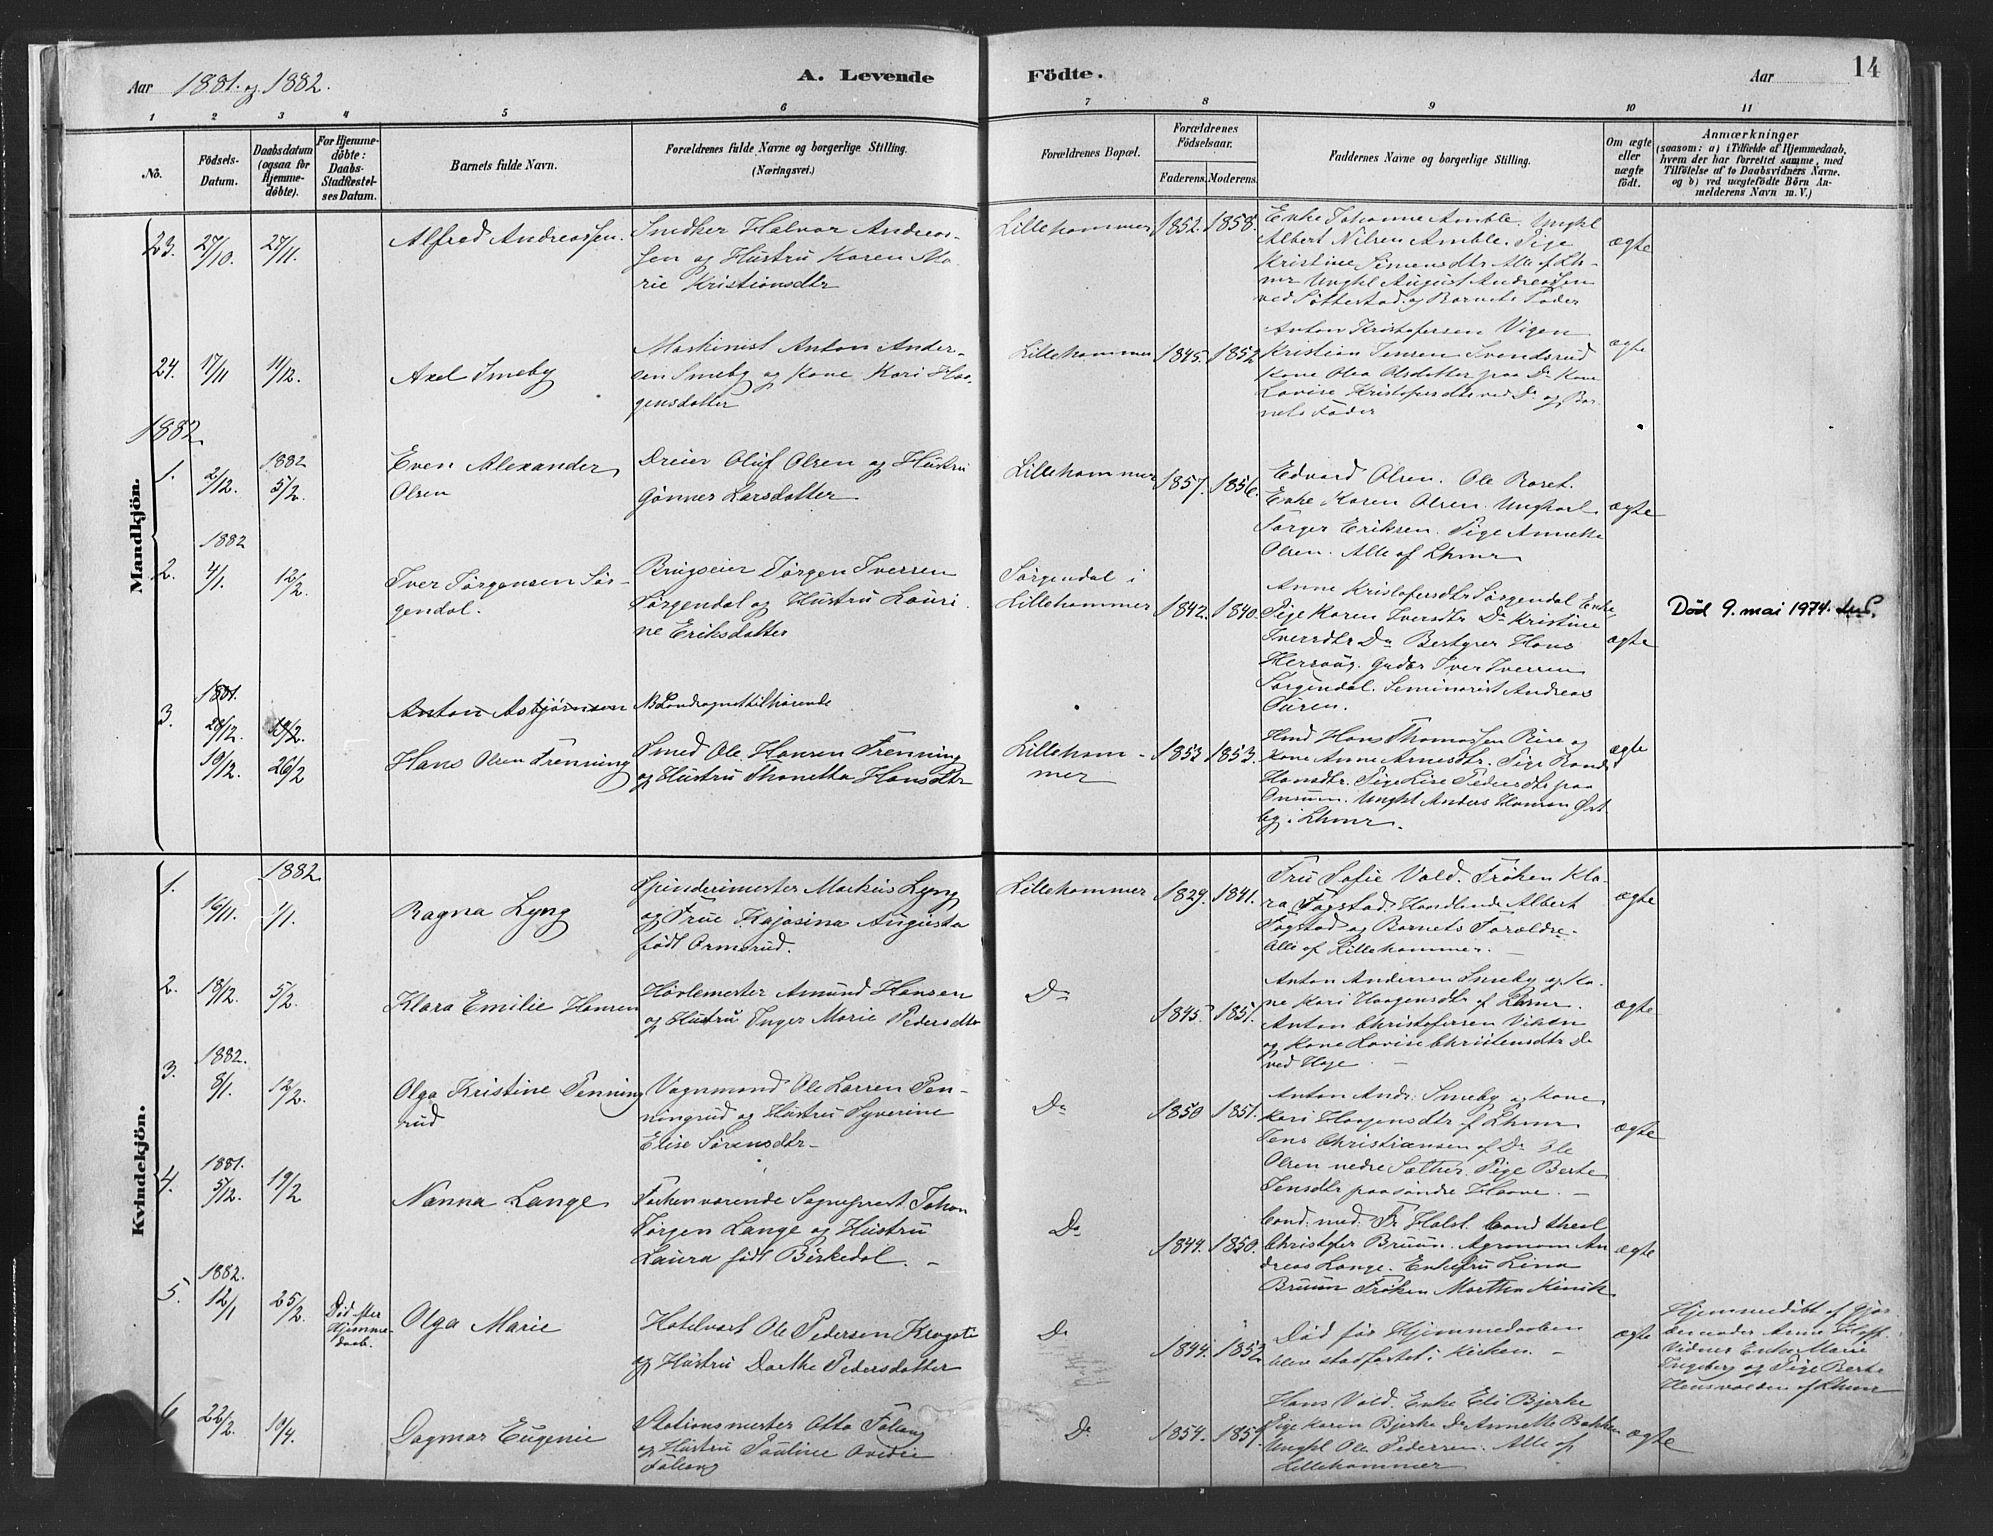 SAH, Fåberg prestekontor, H/Ha/Haa/L0010: Parish register (official) no. 10, 1879-1900, p. 14